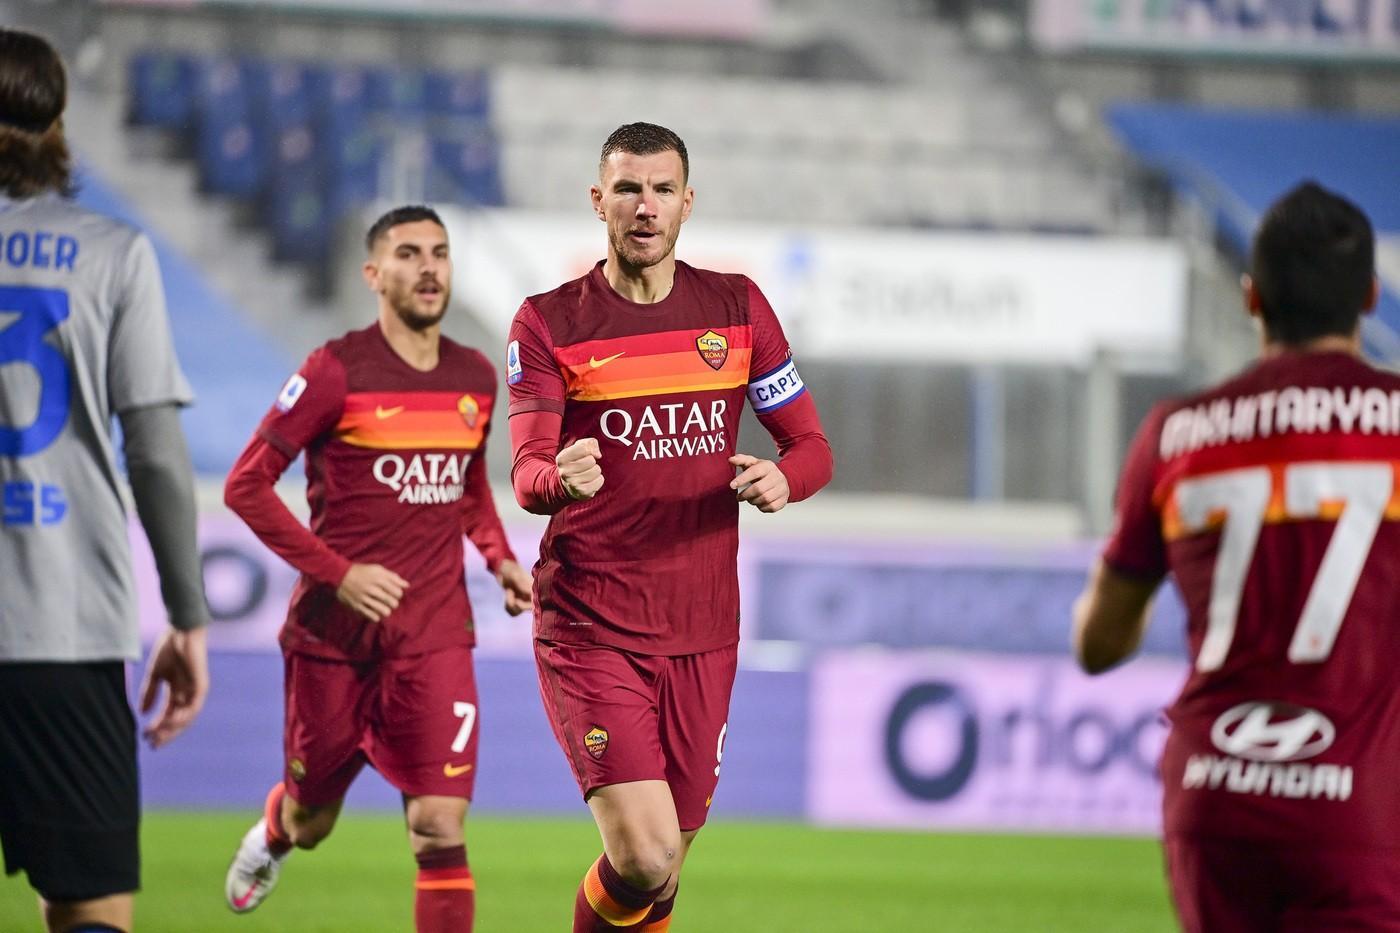 Assist di Mhkitaryan e gol di Dzeko: 0-1 a Bergamo!